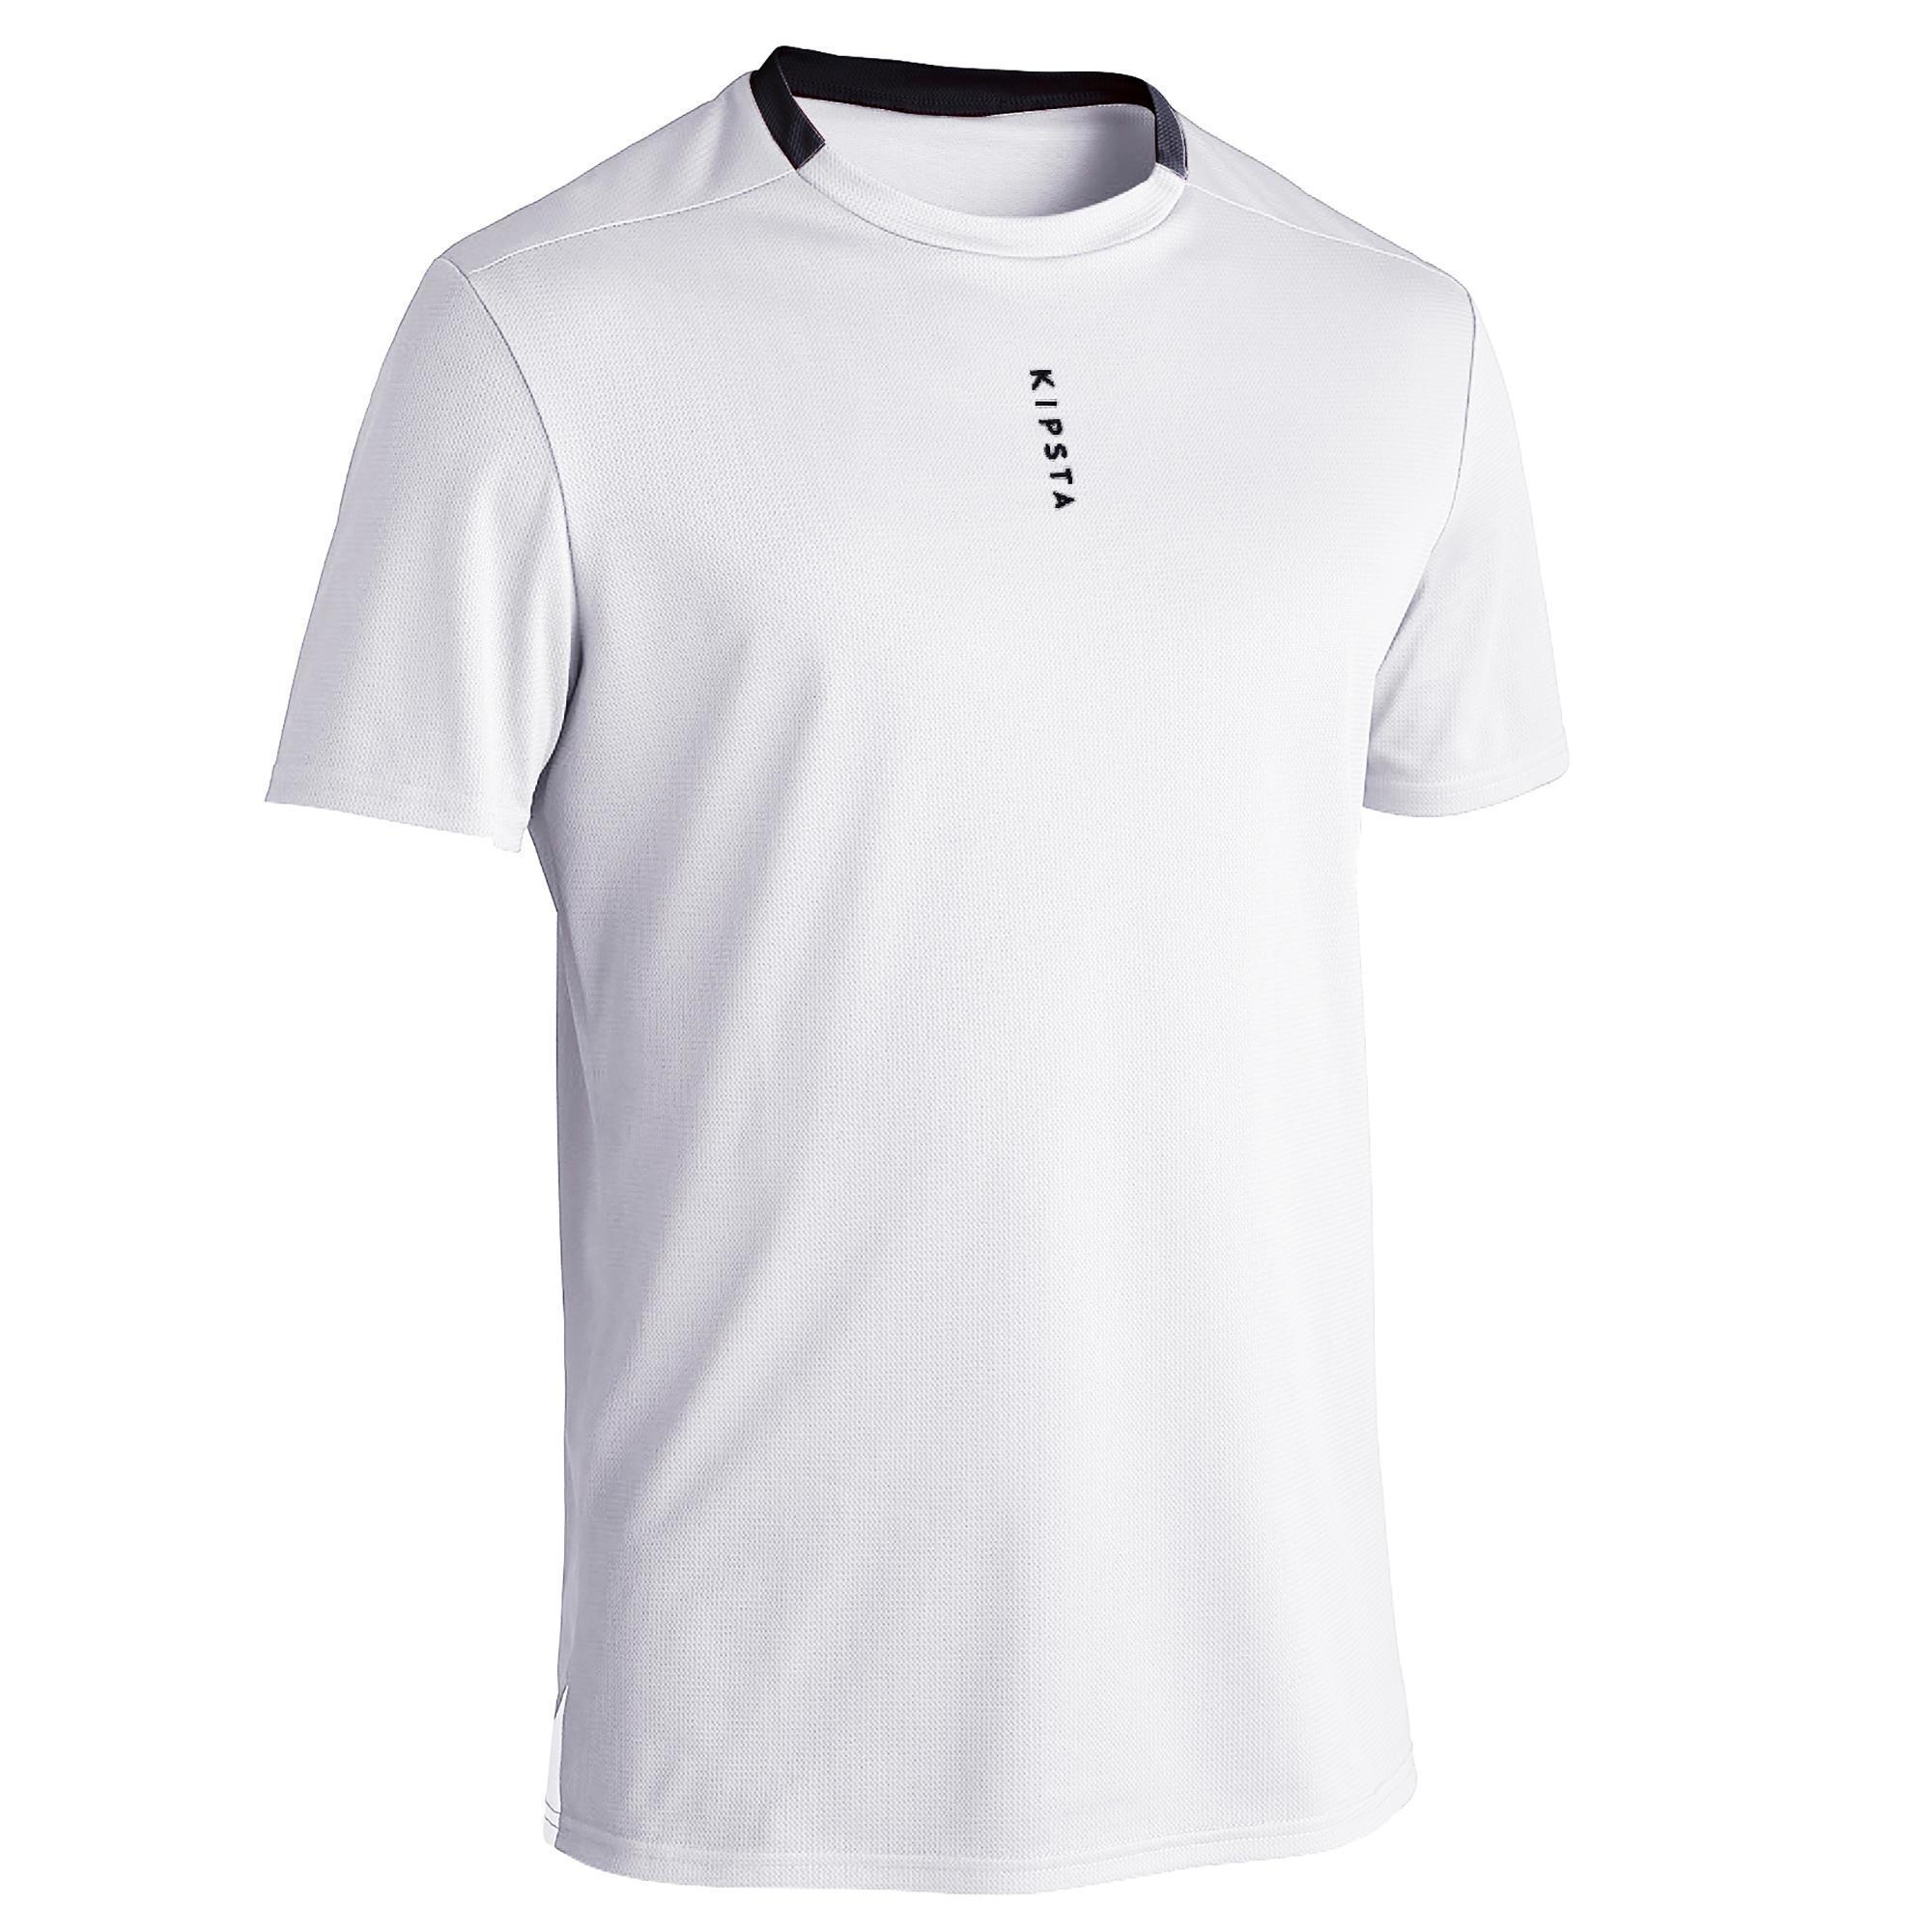 Fussballtrikot F100 Ecodesign Damen/Herren weiss